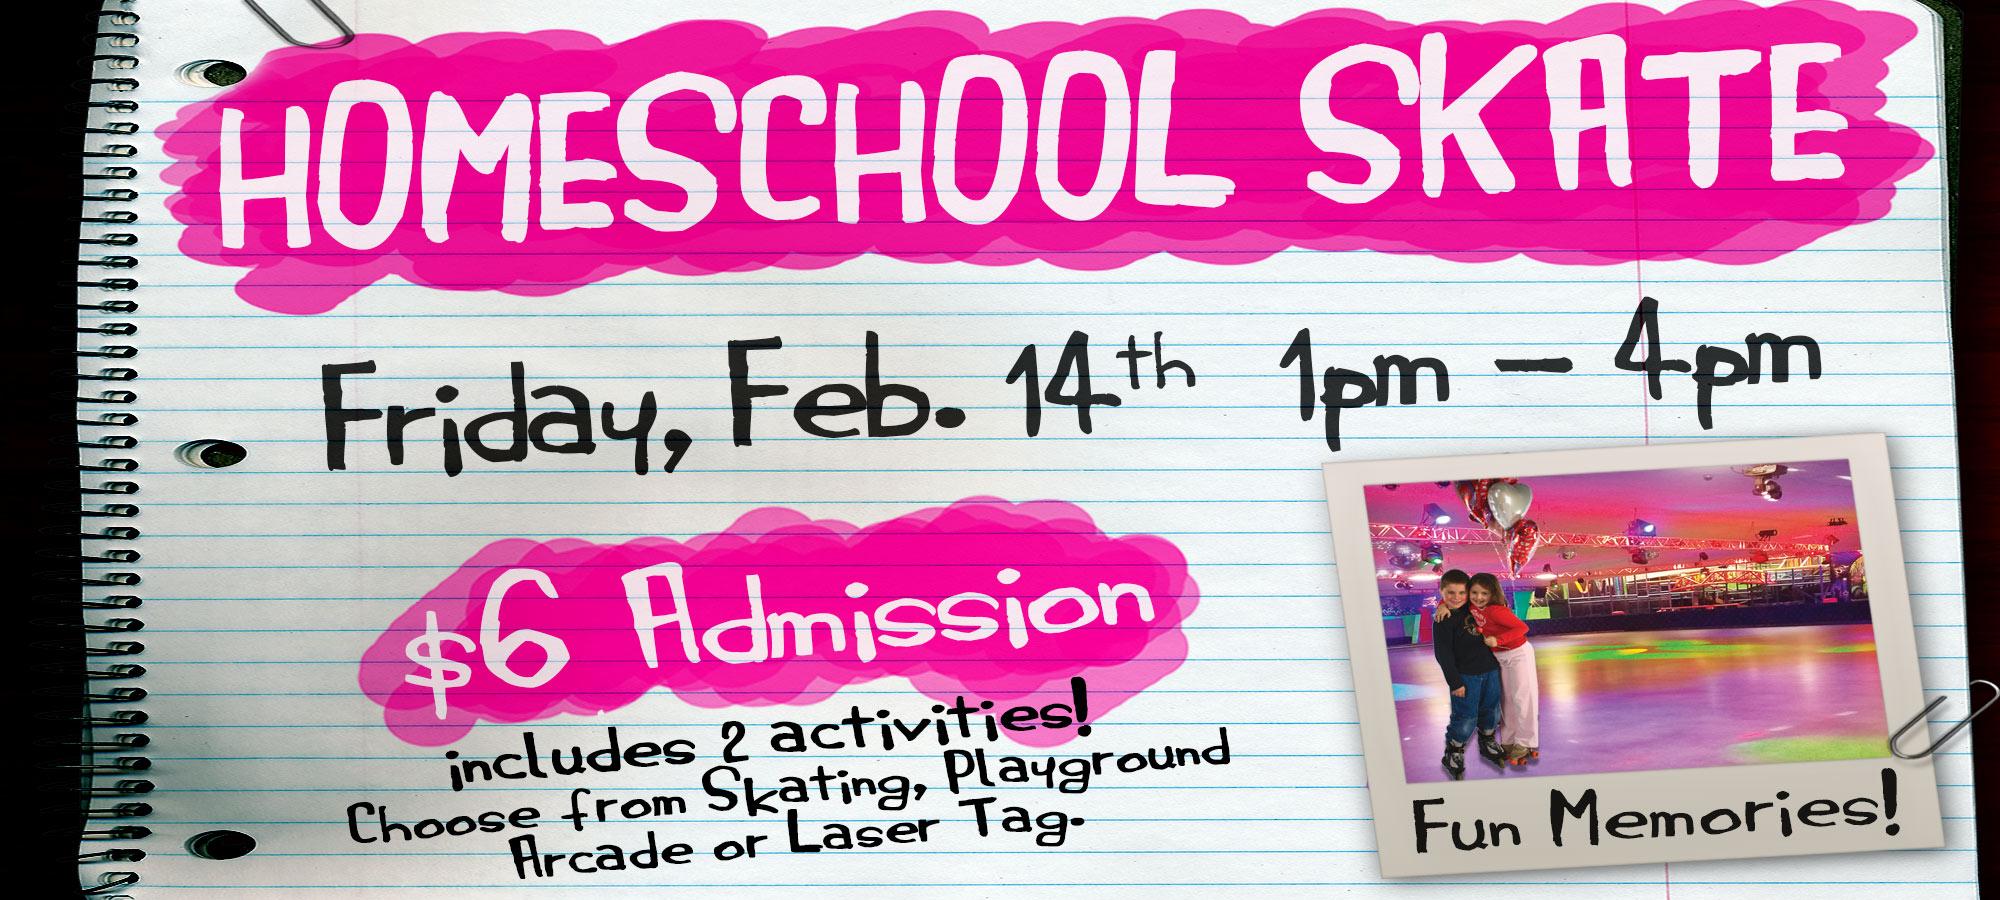 Homeschool-Both-February-2020